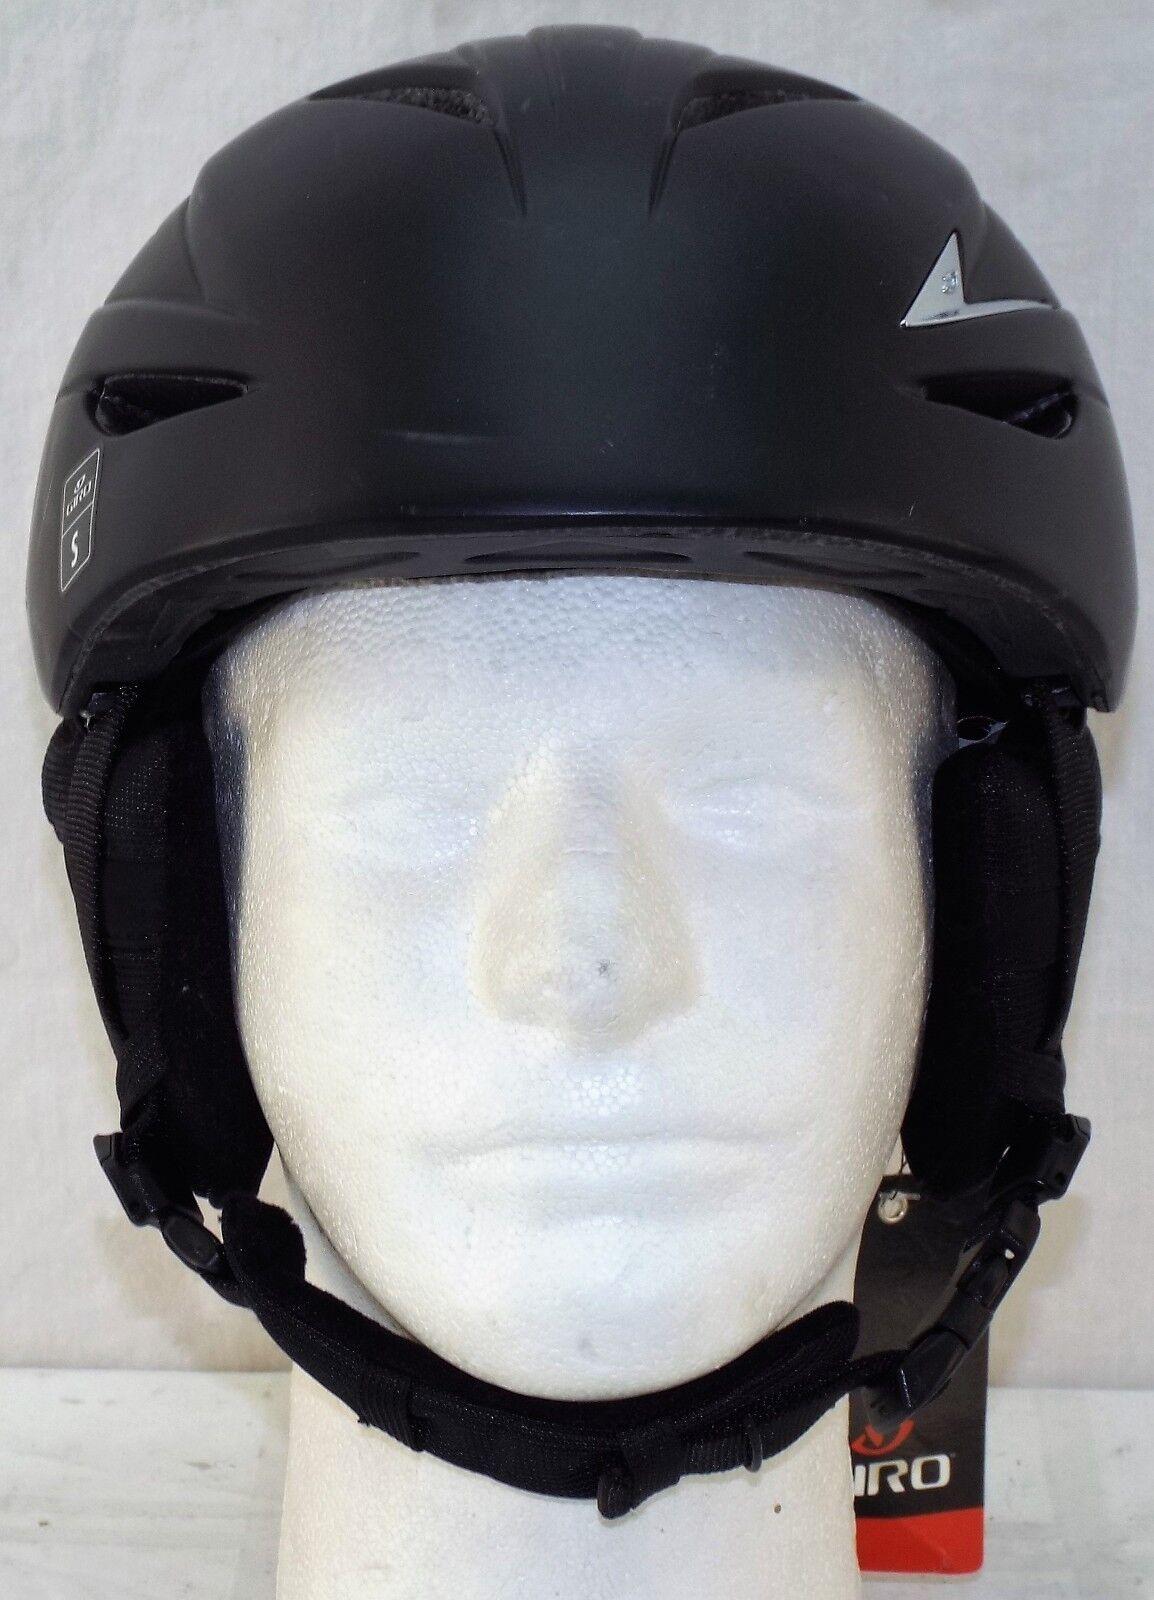 Giro G10  New Ski Helmet Size Small  very popular